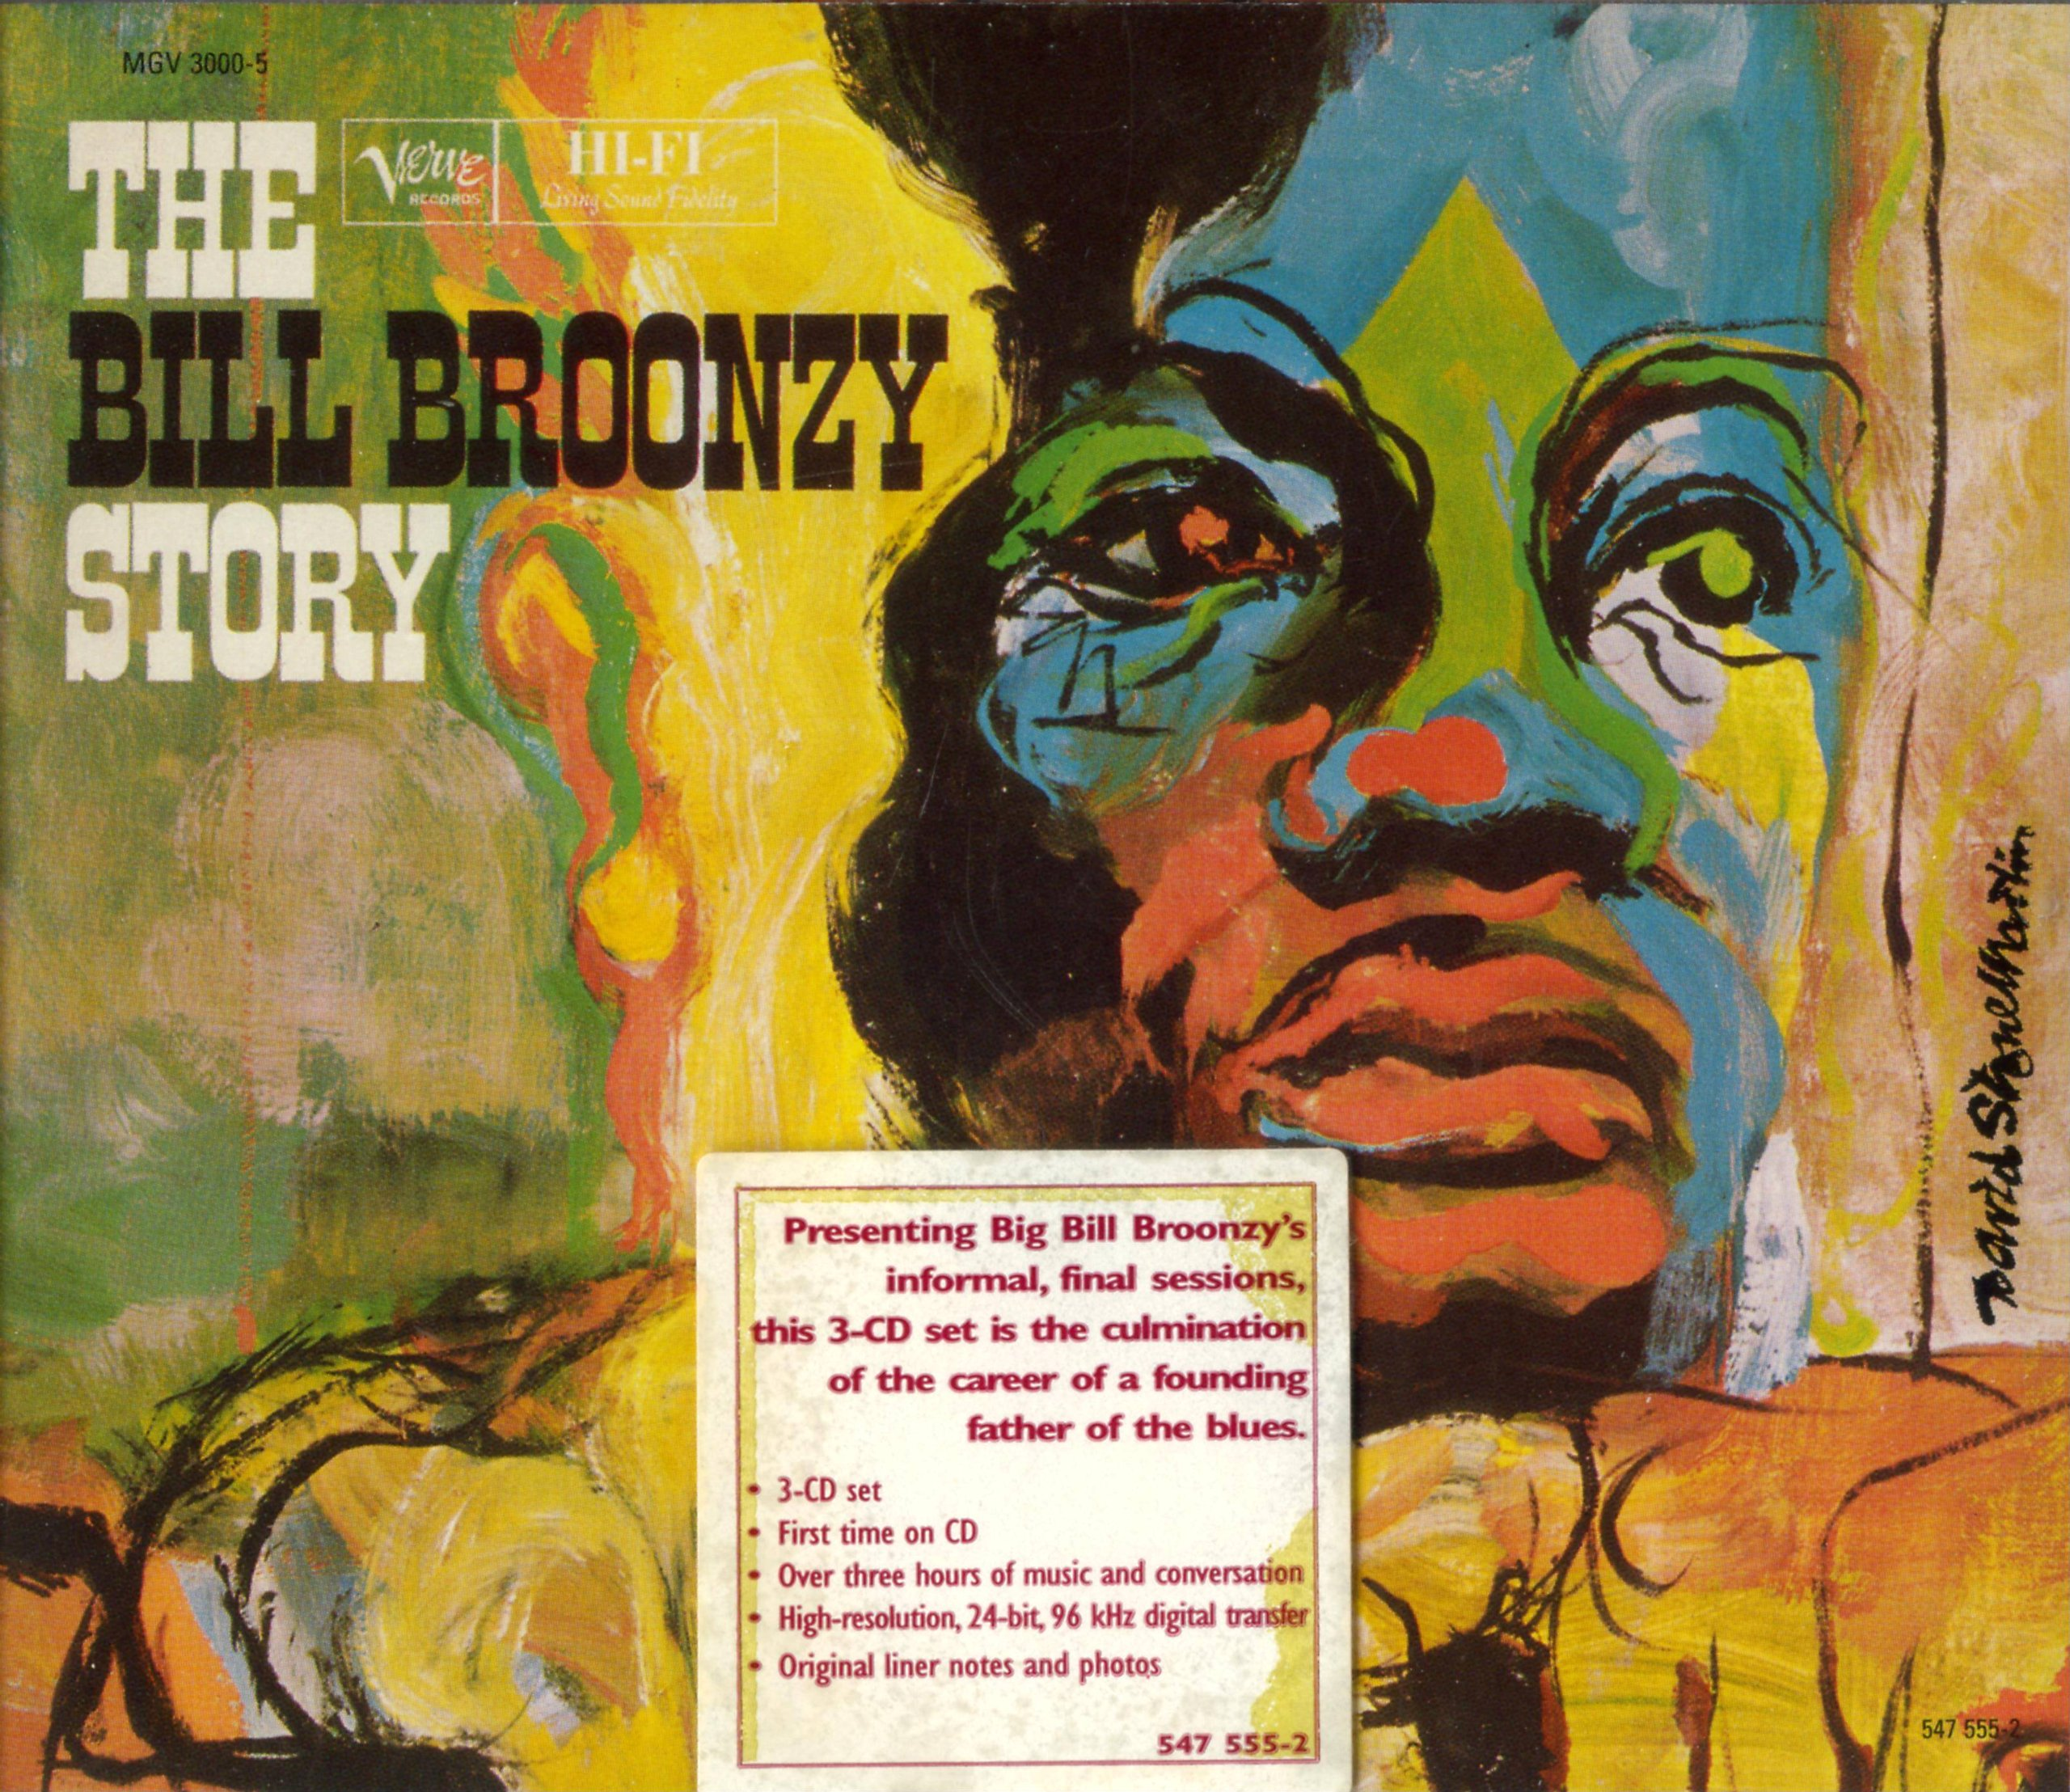 Bill Broonzy Story